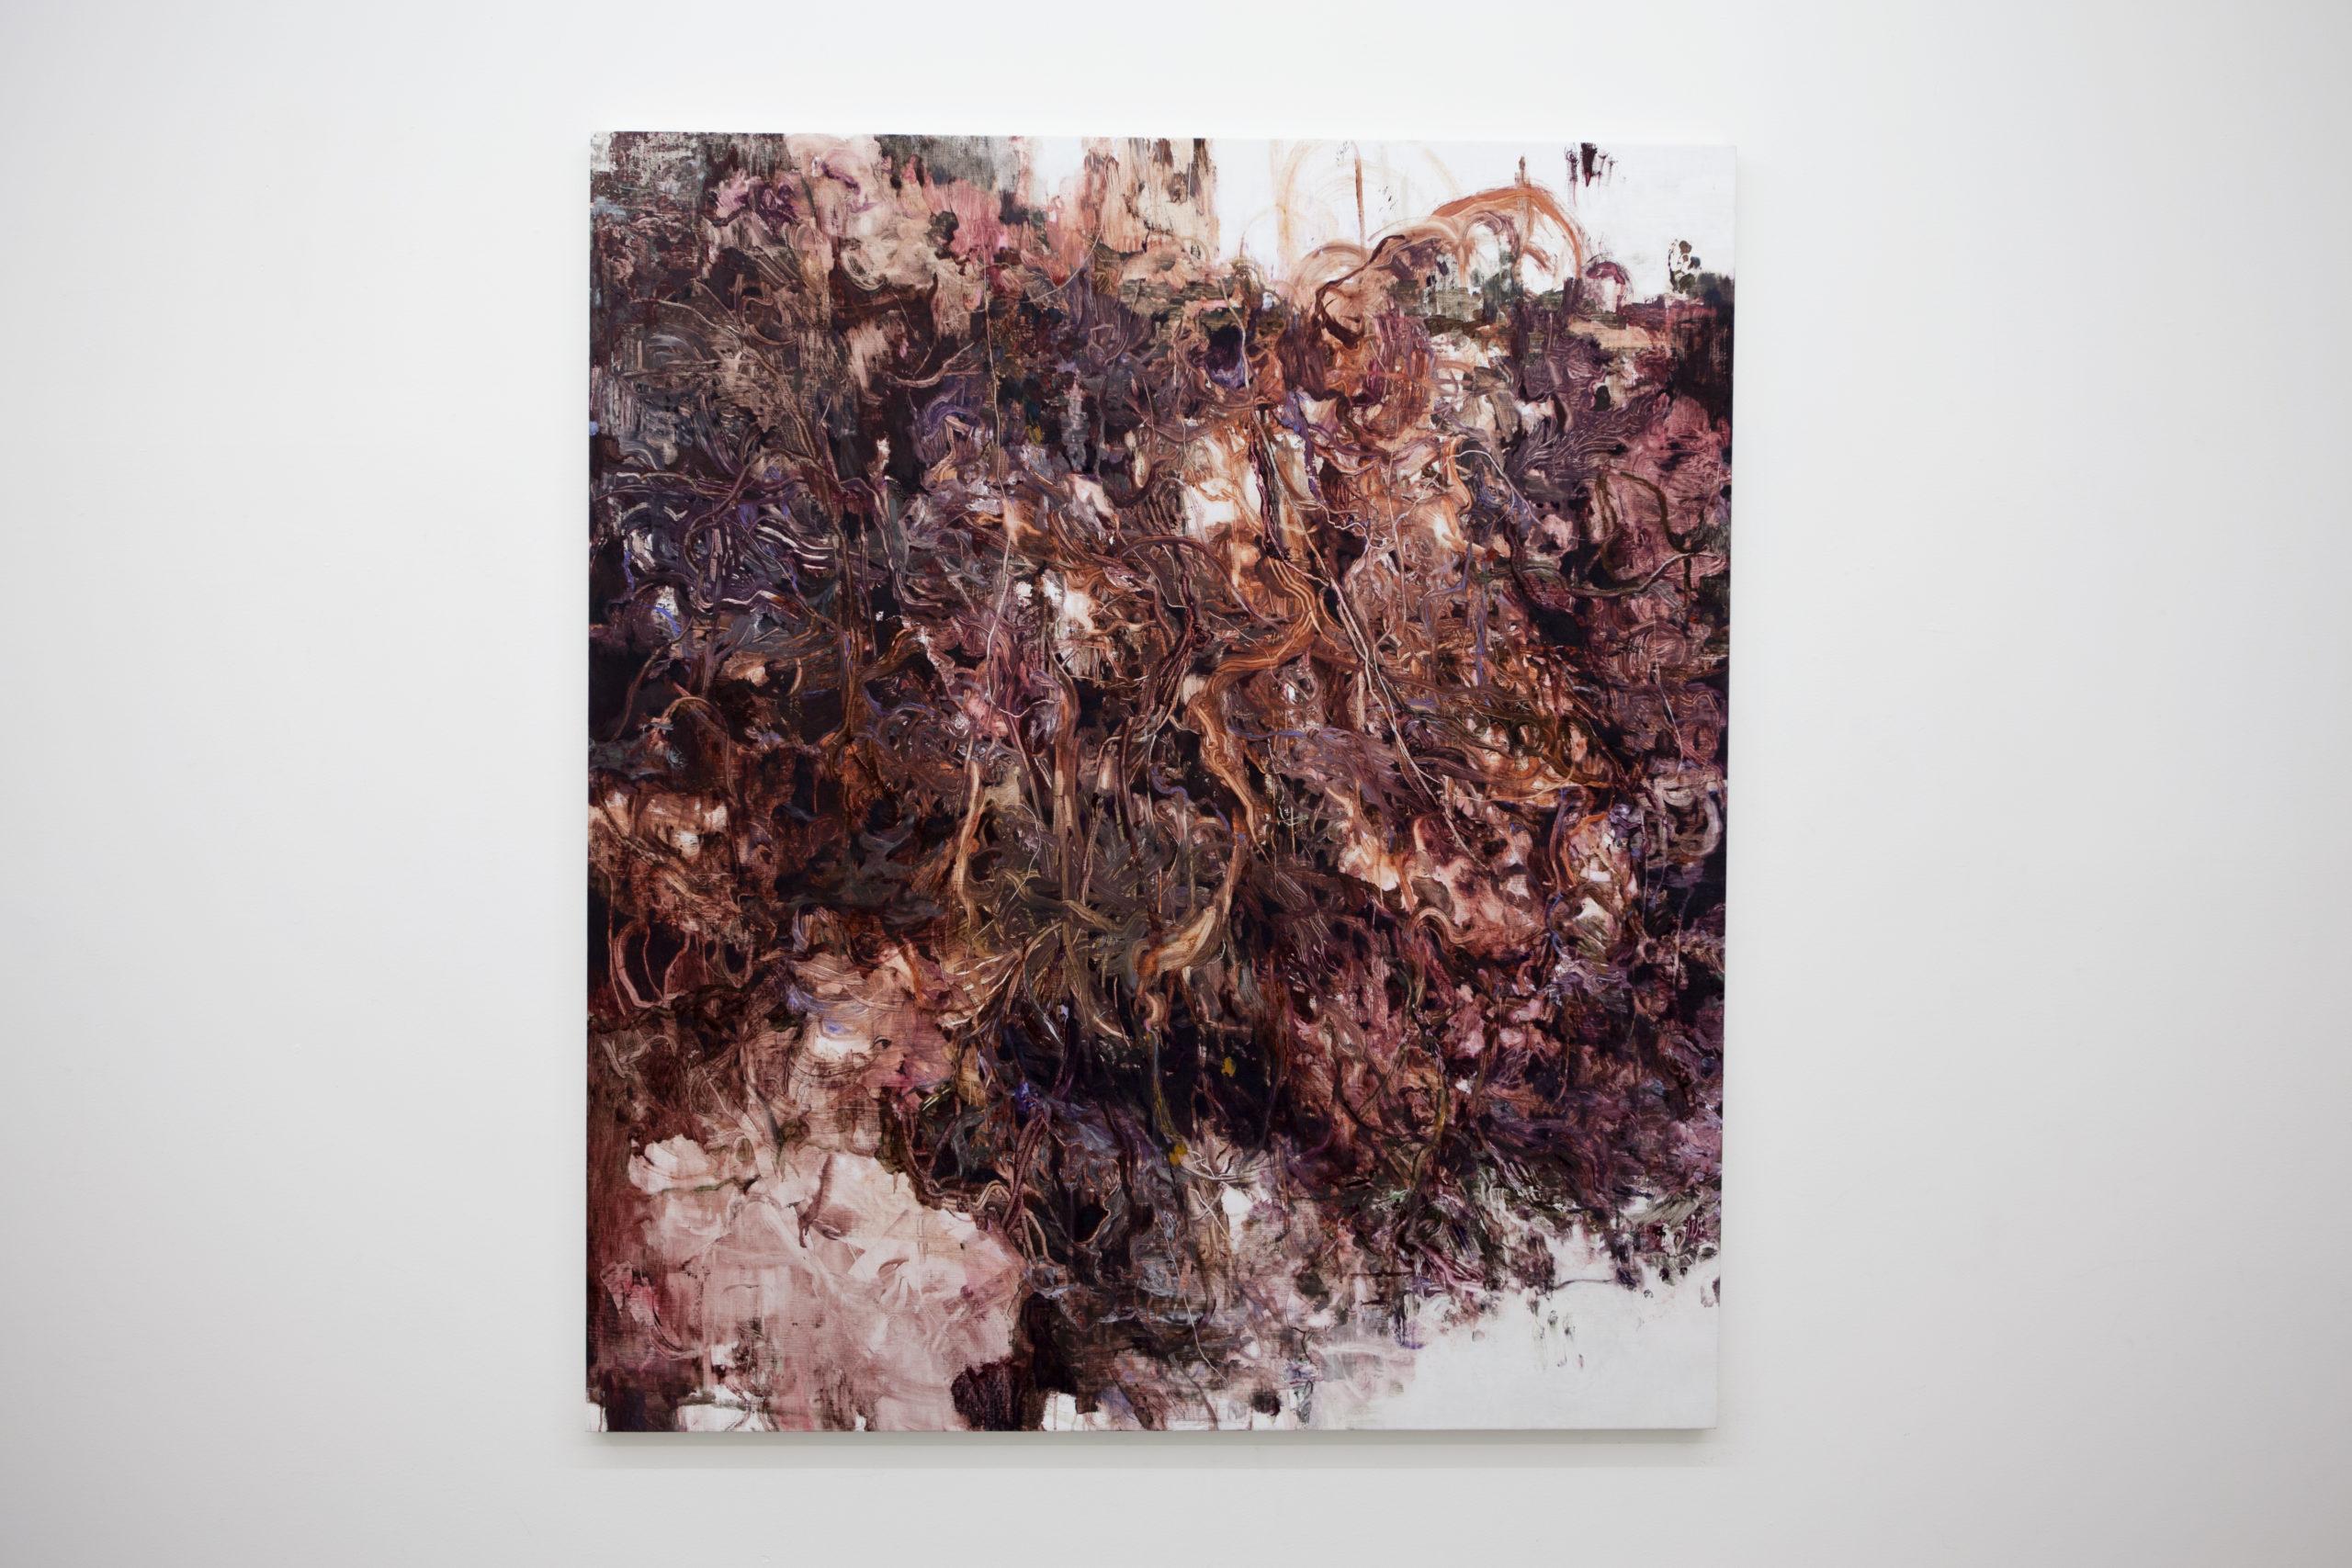 Christina Ekstrand - Incision, S.P.G